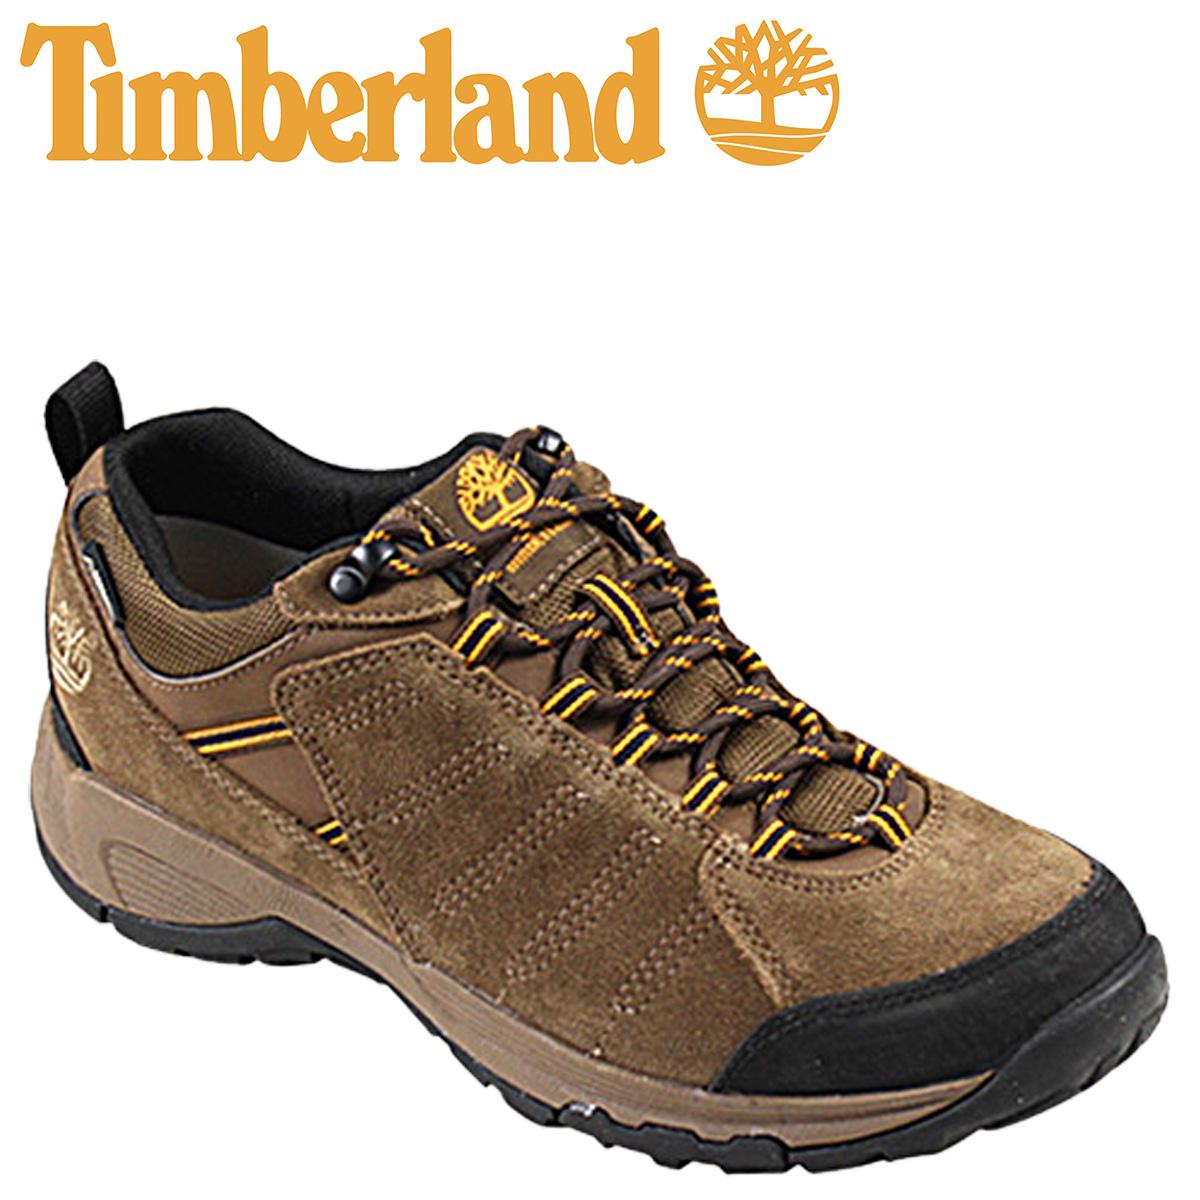 01c329ac32d Timberland Timberland Chilton low Gore-Tex hiking shoes TILTON LOW GORE-TEX  HIKING SHOES 9741R dark brown men